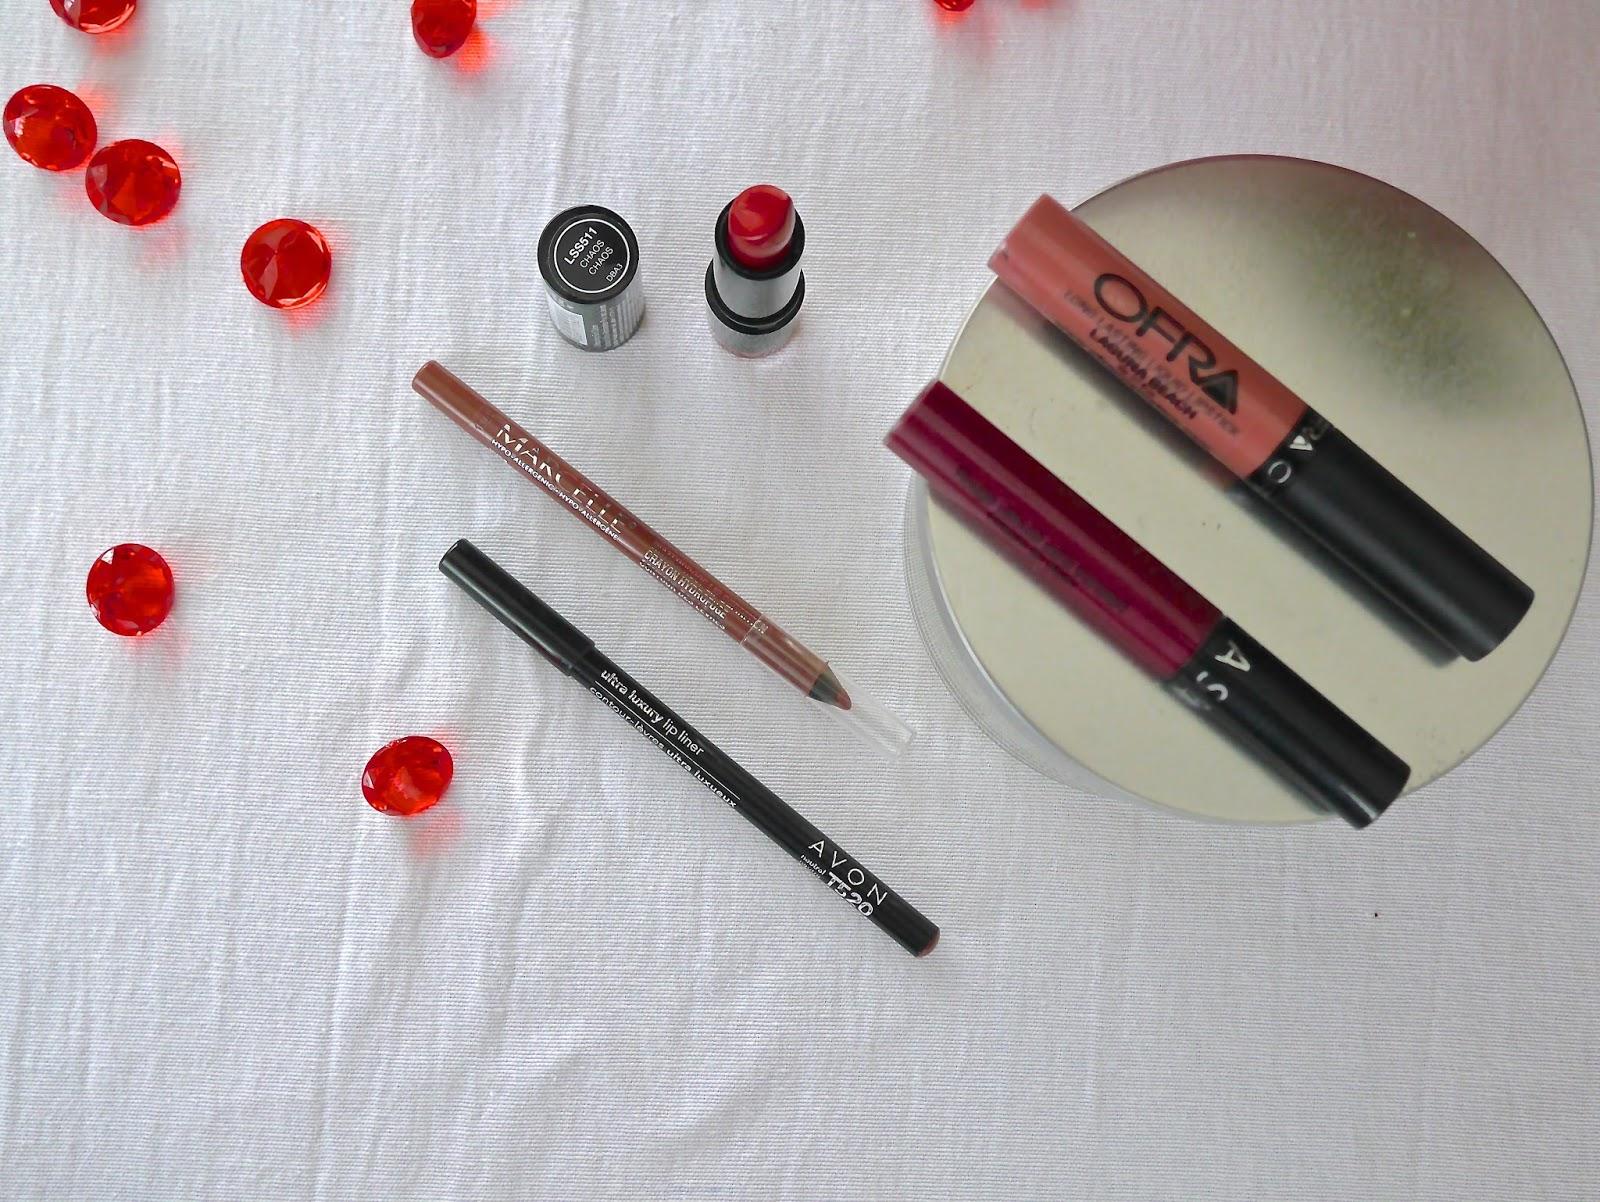 Favourite lipsticks for winter